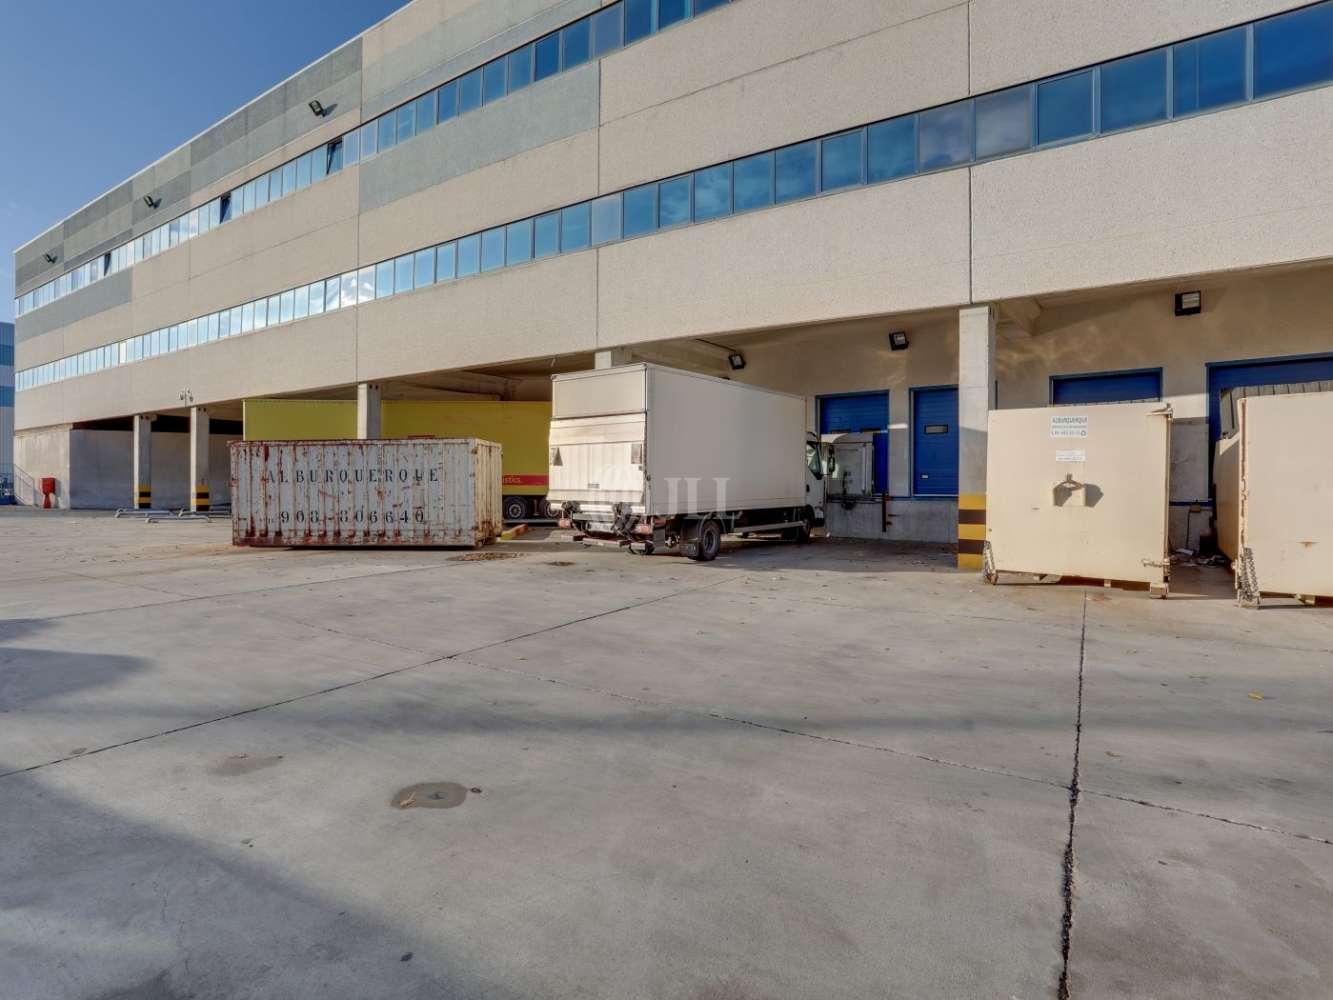 Naves industriales y logísticas Getafe, 28906 - Nave Logistica - M0392 NAVE LOGISTICA ALQUILER P.I SAN MARCOS GETAFE P3 - 22499